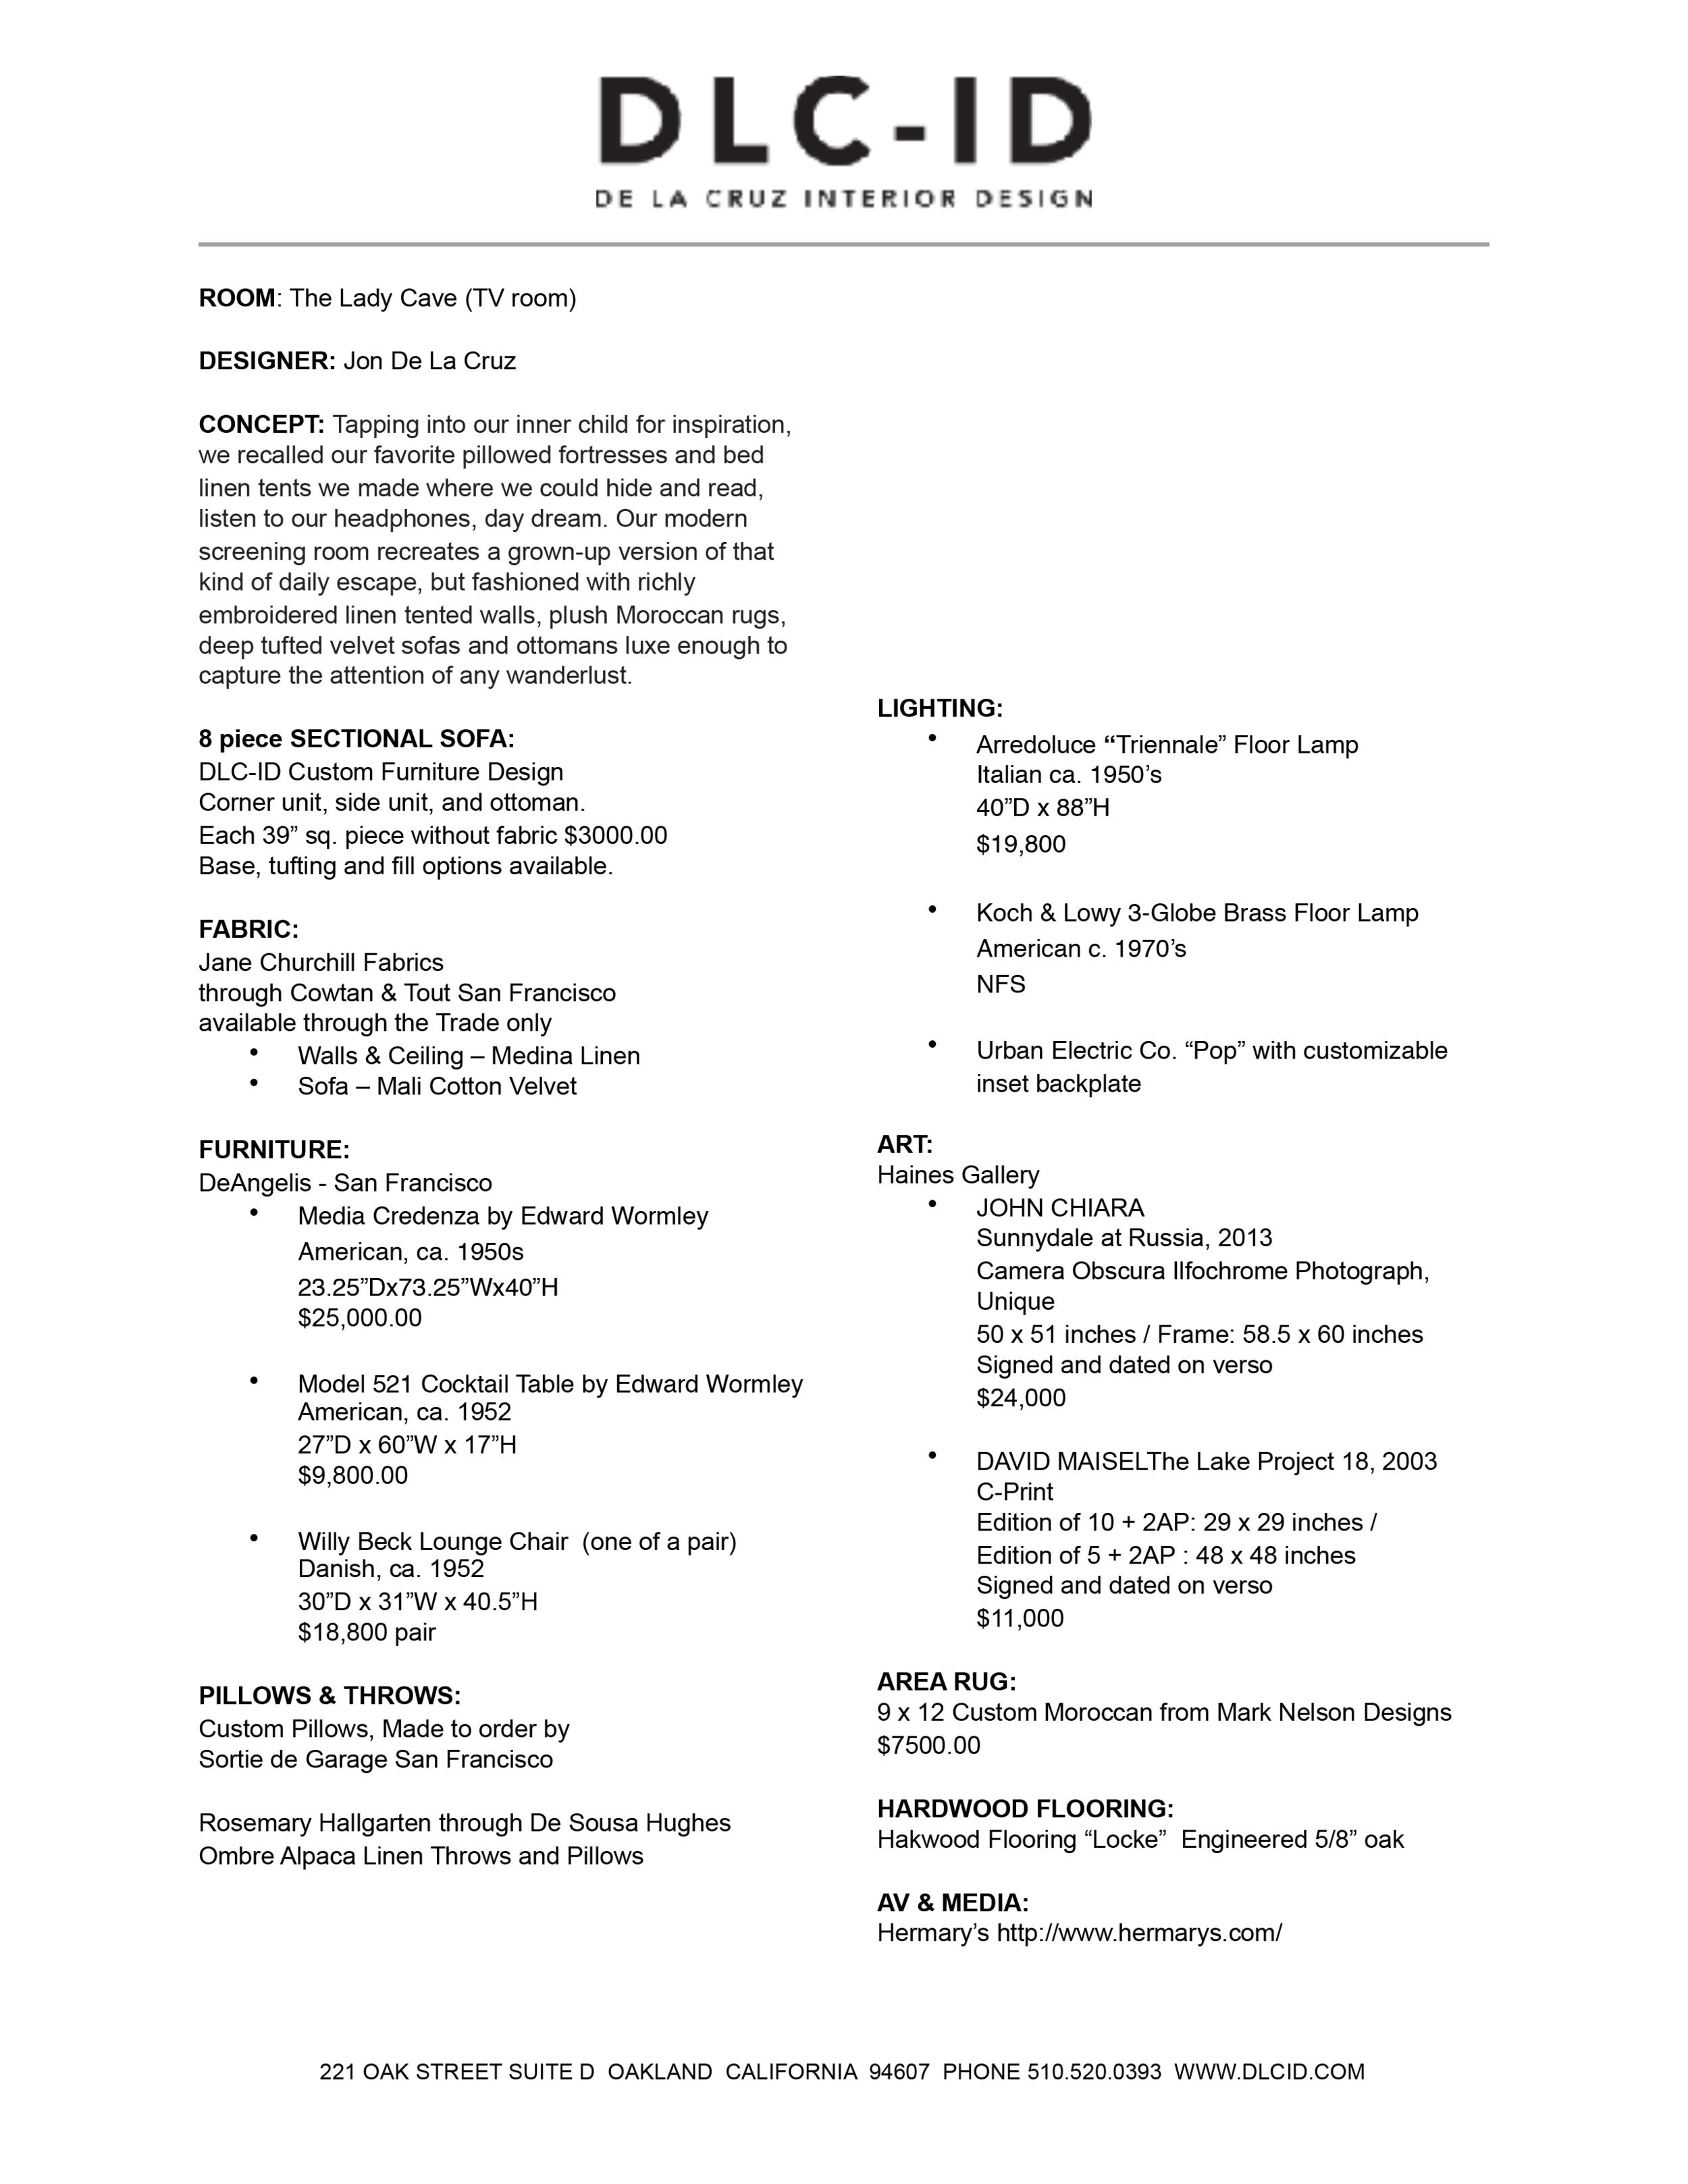 DLC-ID Showcase 18 Lady Cave Furnishing & Vendor Info_180425.png